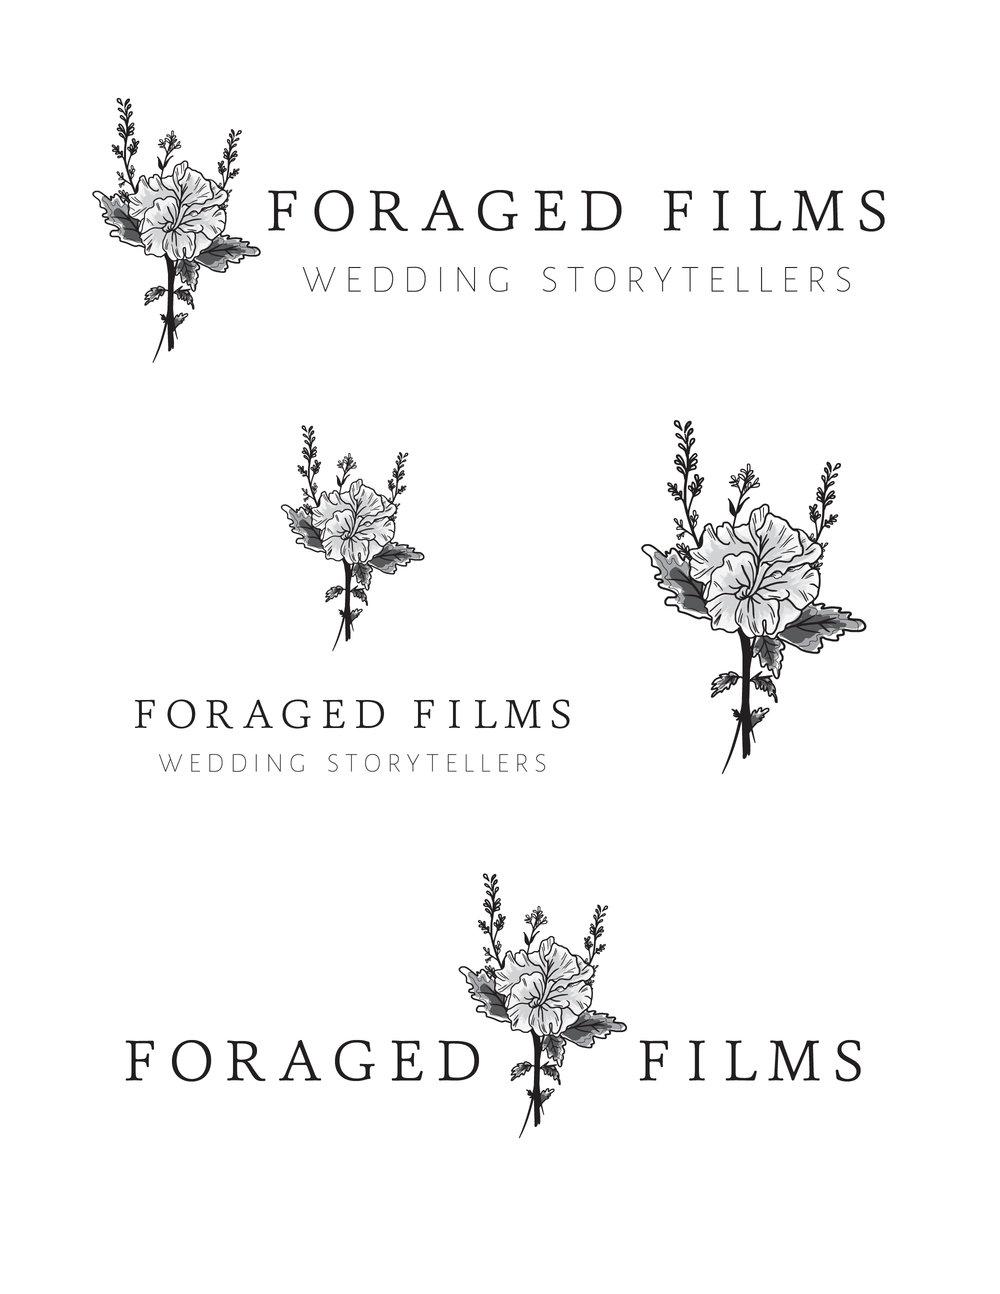 foragedfilms_logos_greyscale.jpg